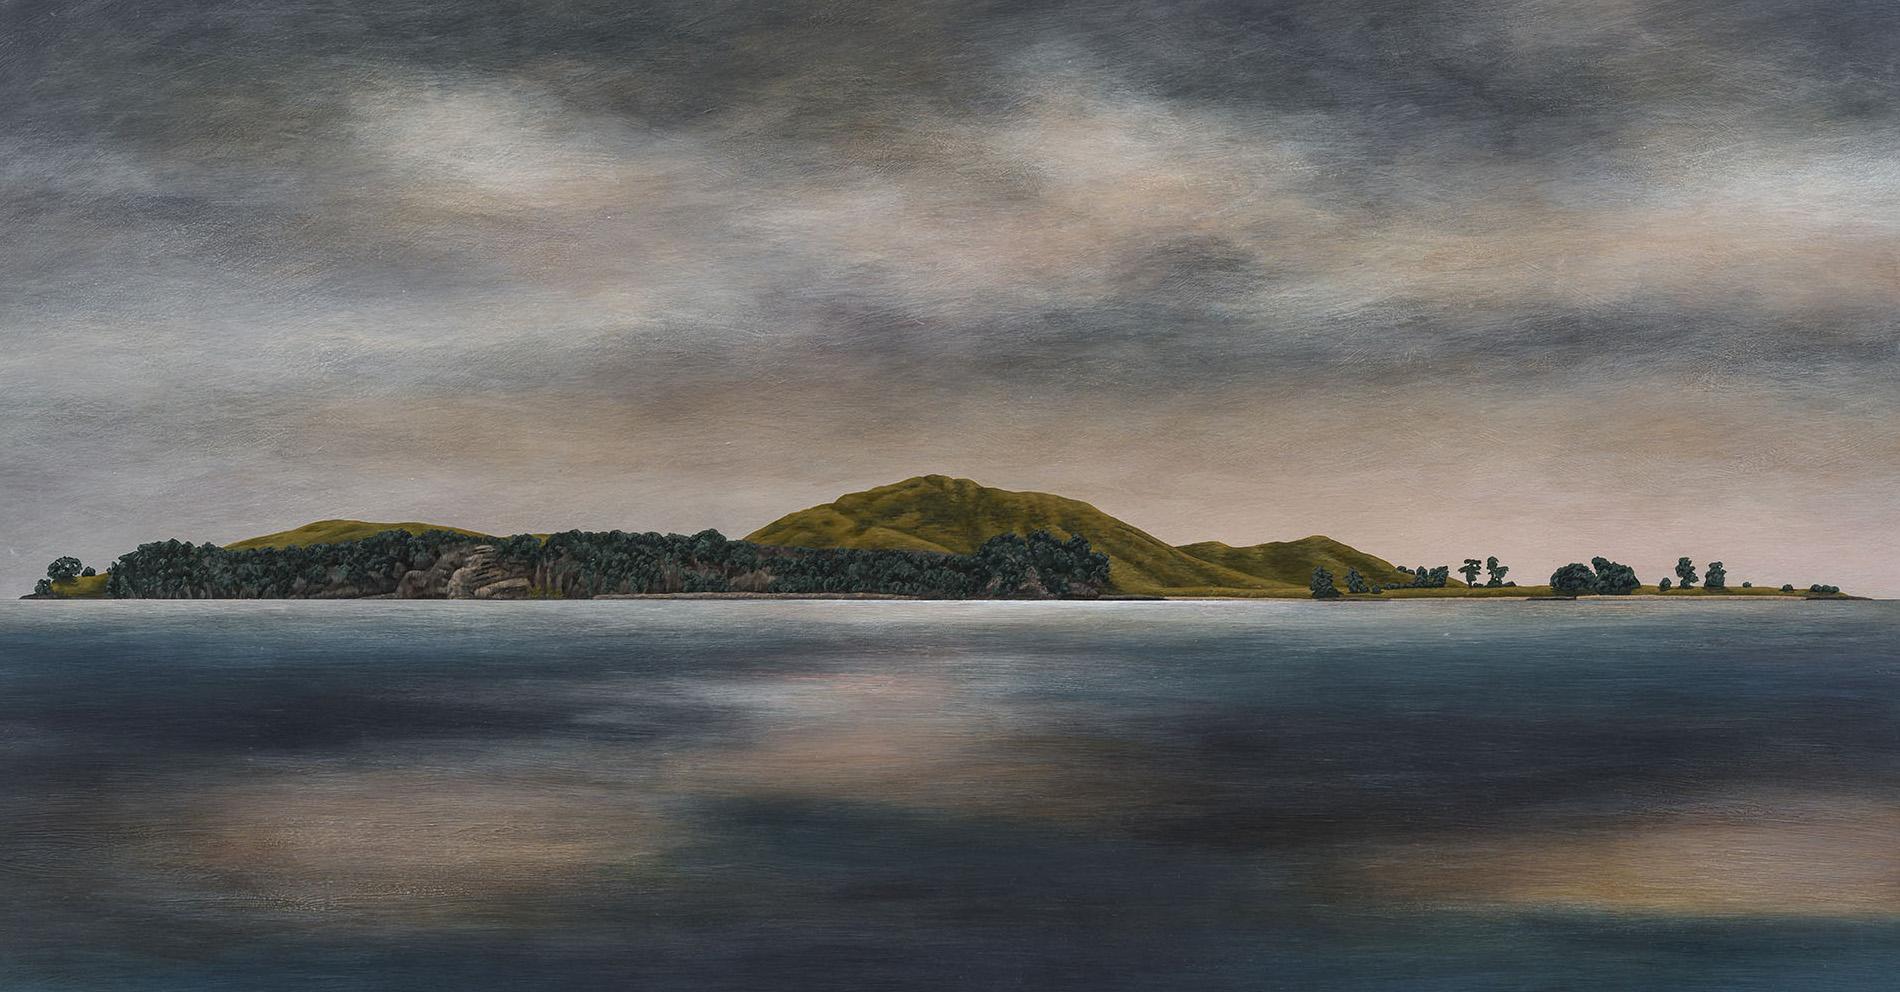 Brown's Island